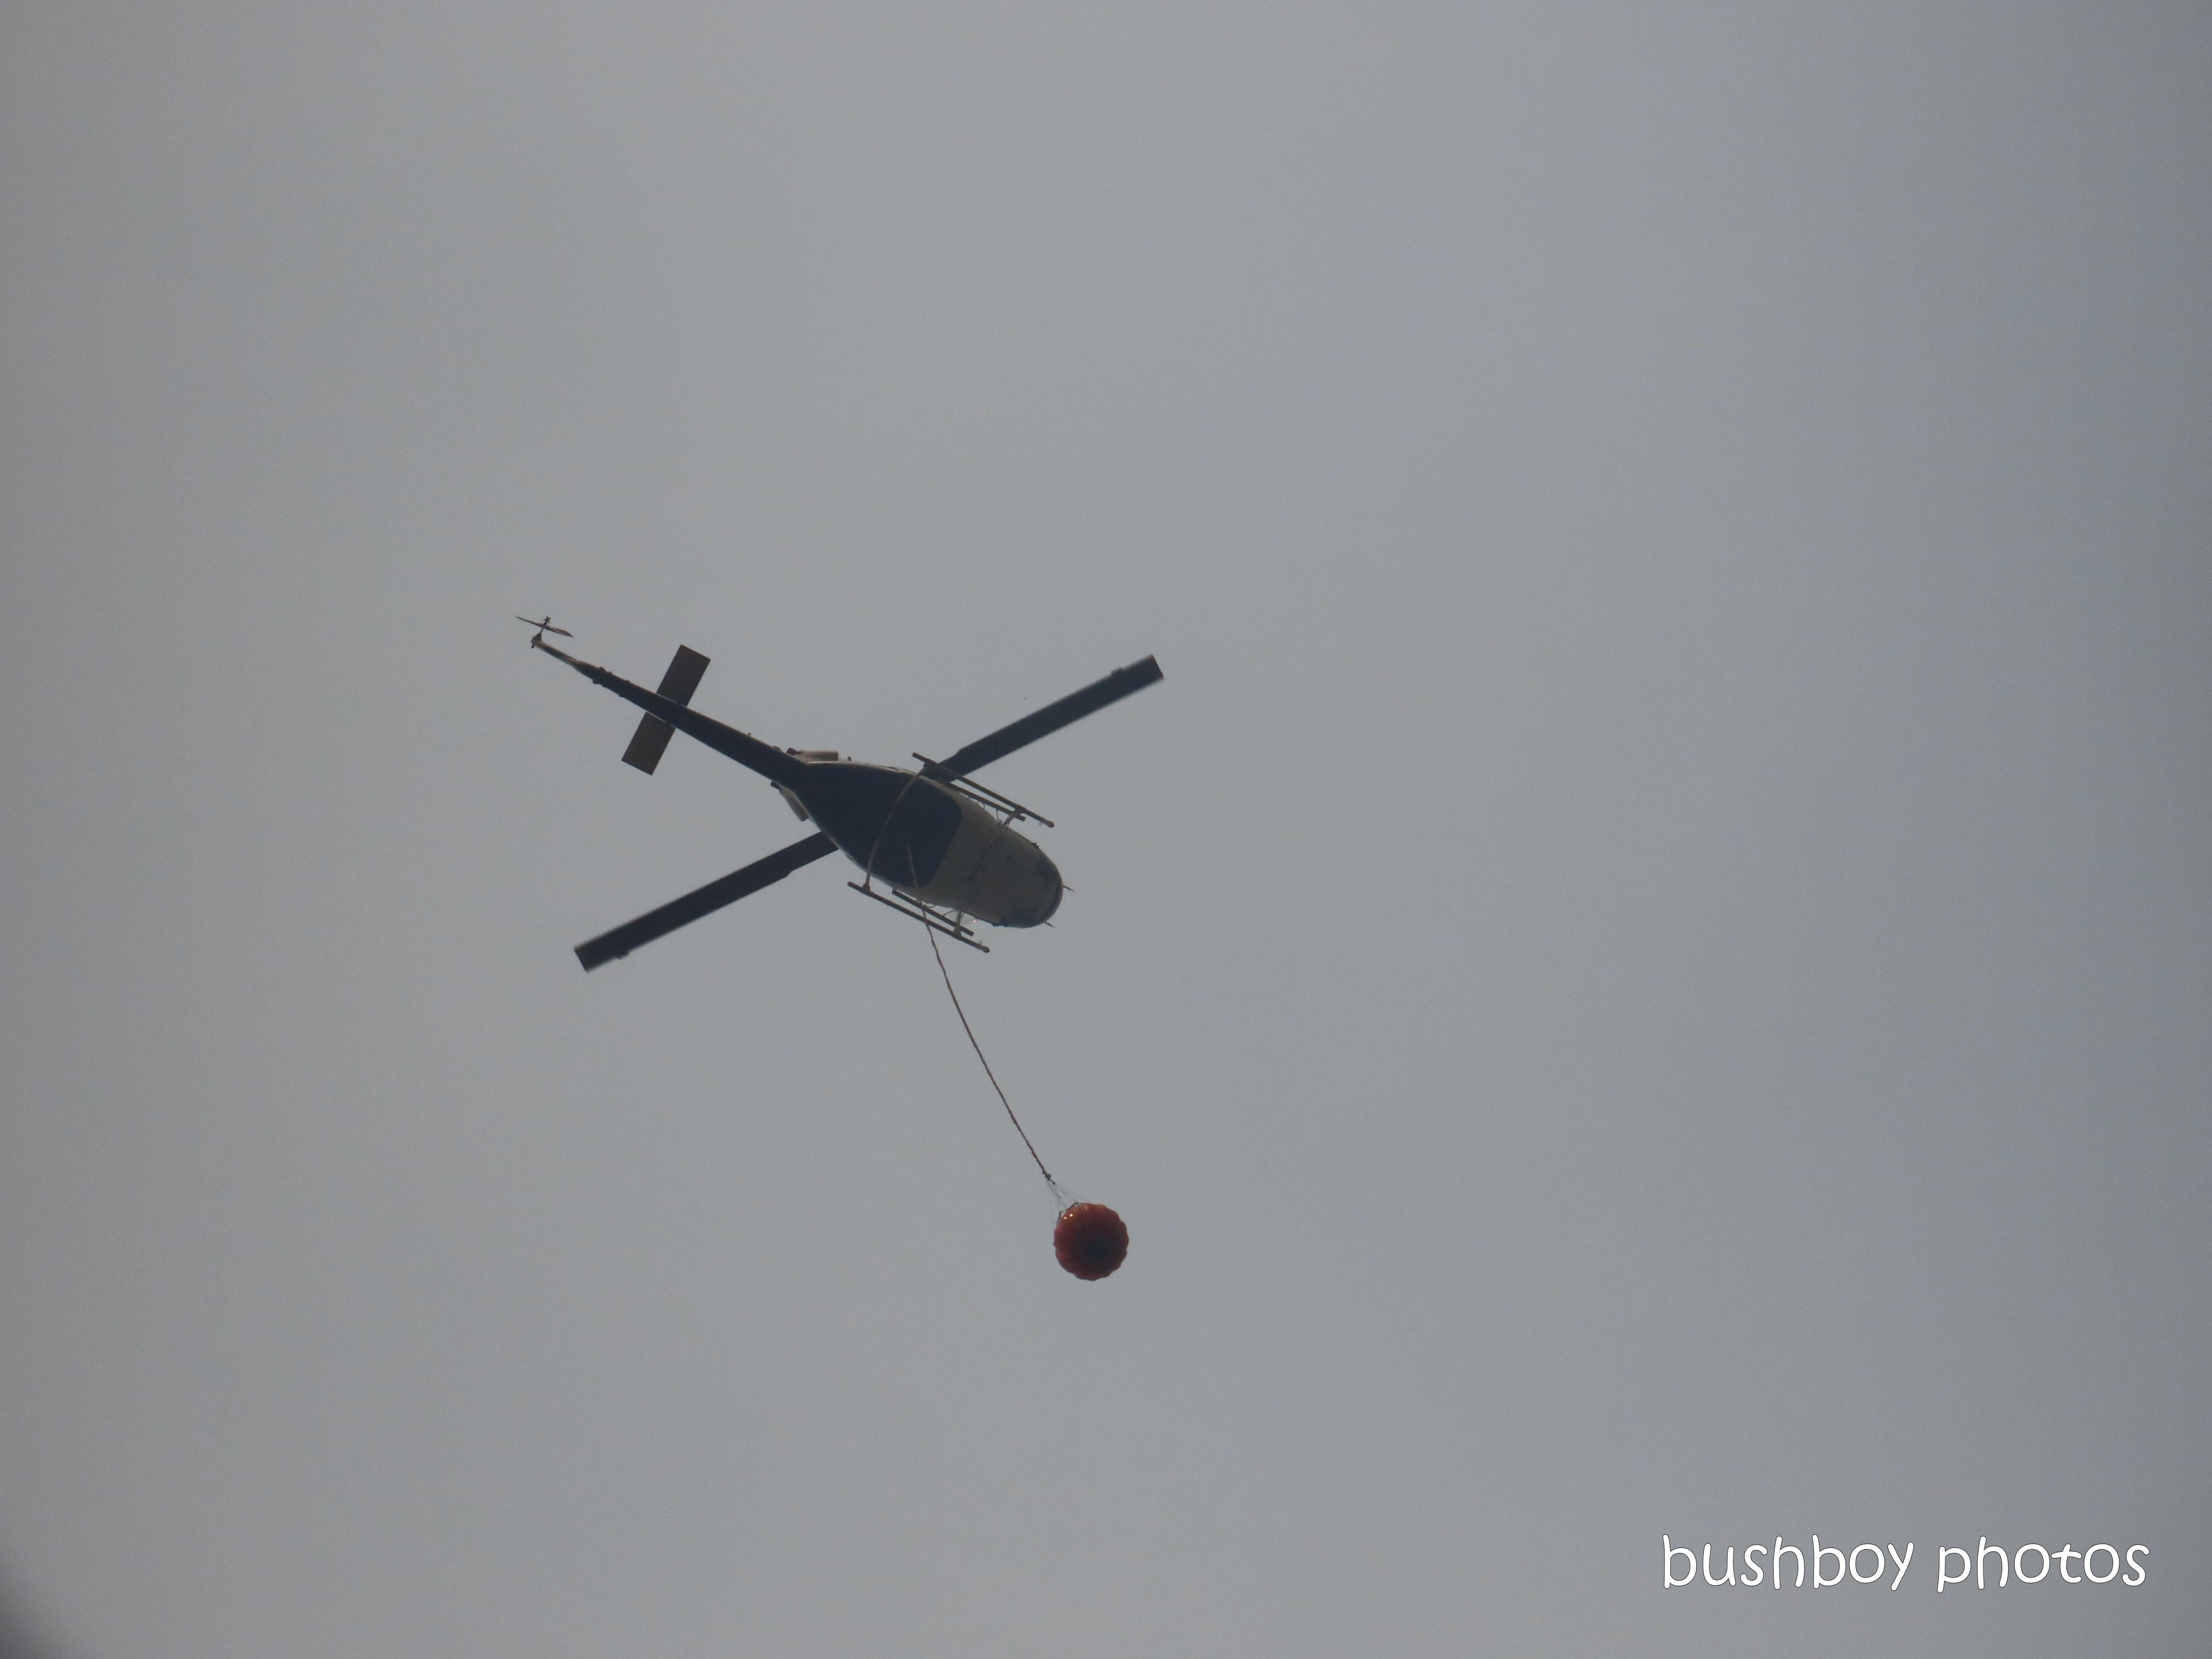 helicopter_close_durranbah_blog_fire_post_dec 2019